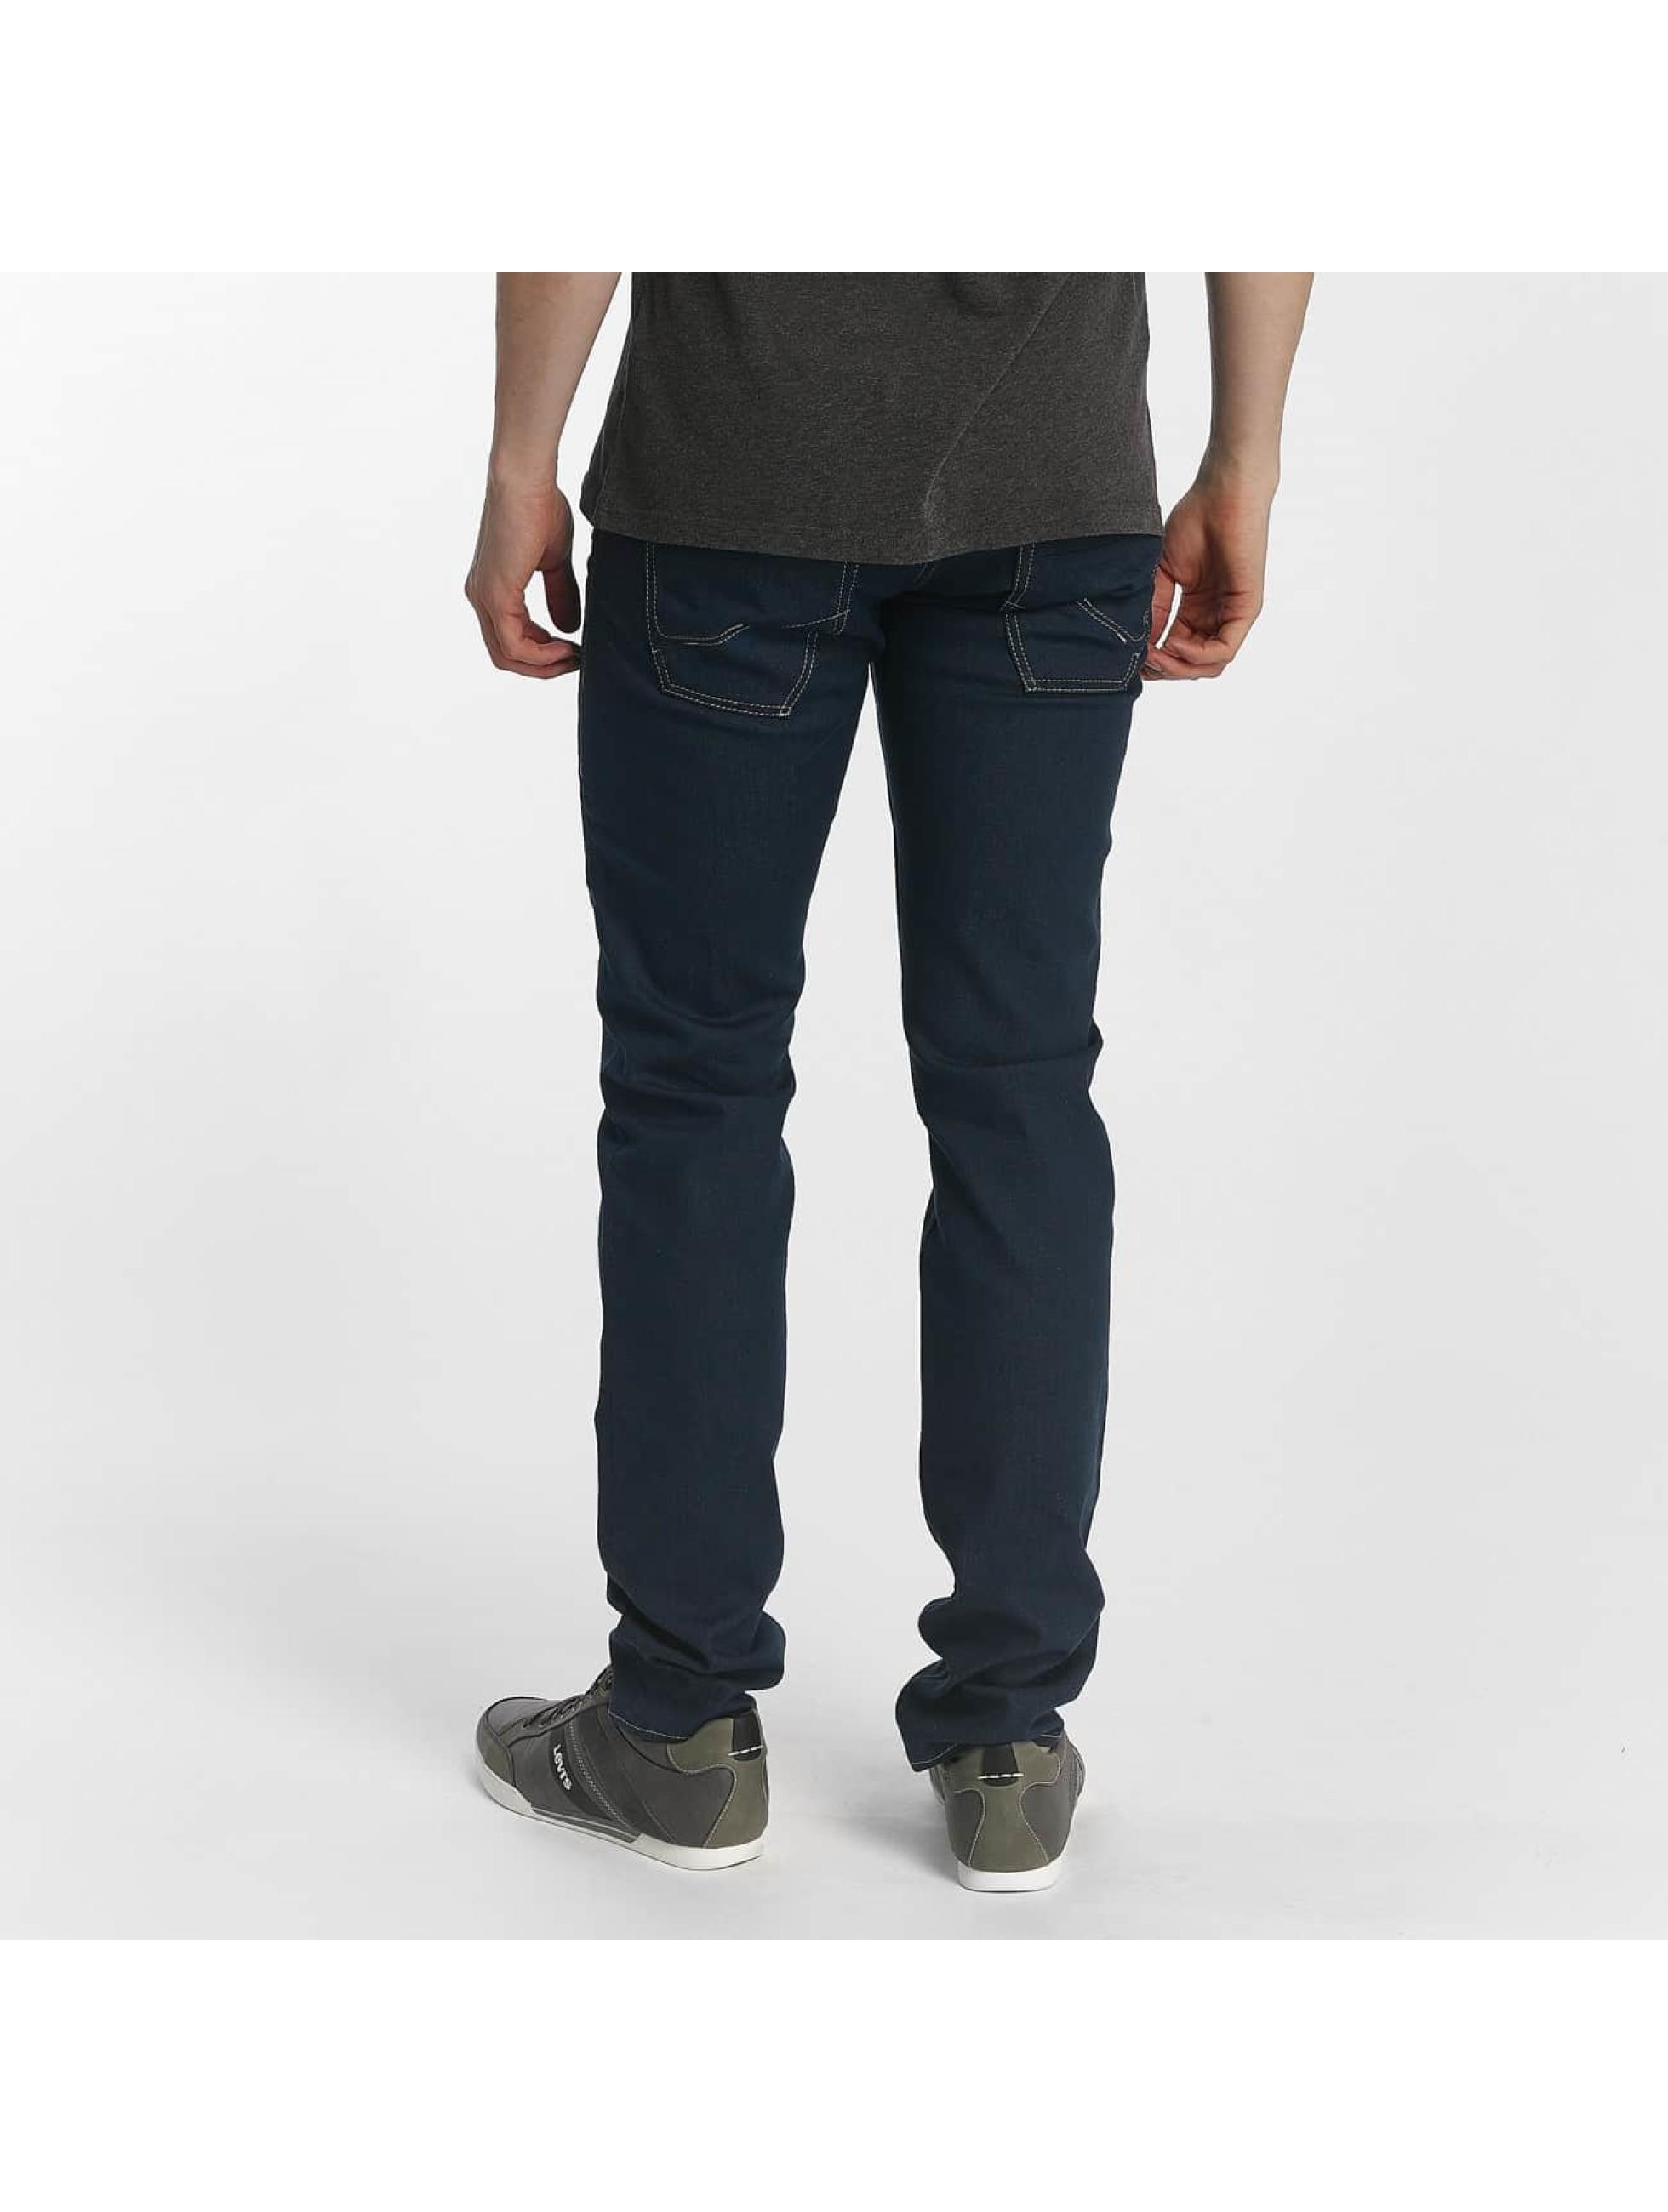 Le Temps Des Cerises Straight fit jeans 700/11 Recycled blauw